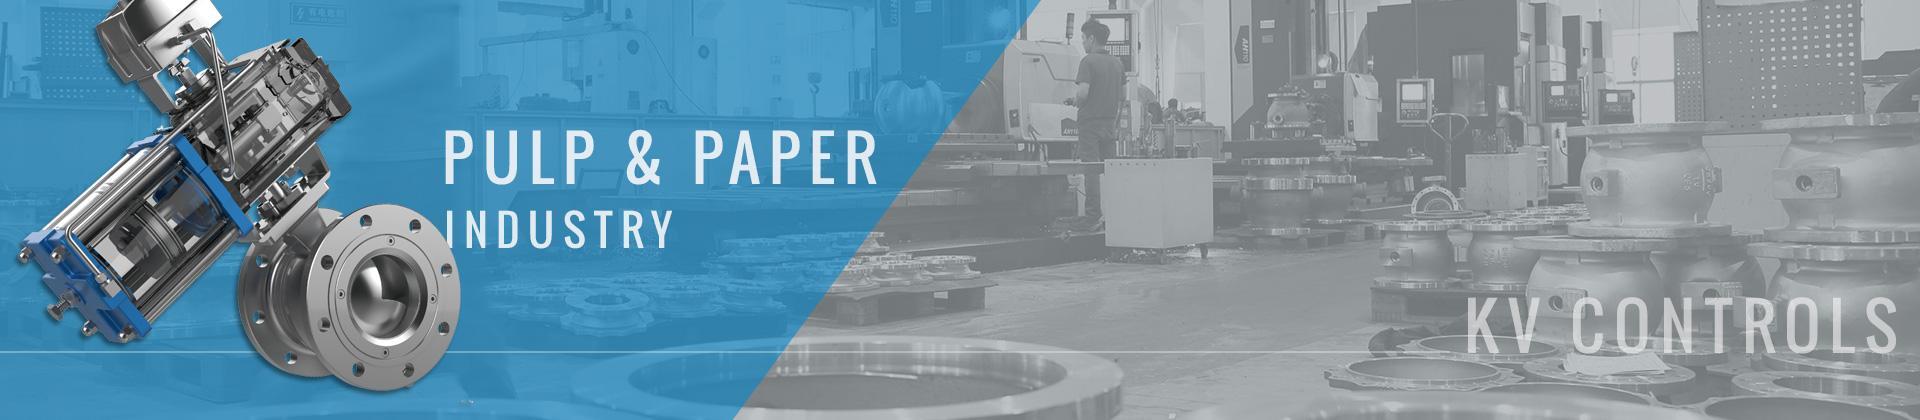 pulp--paper-industry-banner-home-rev-1.jpg